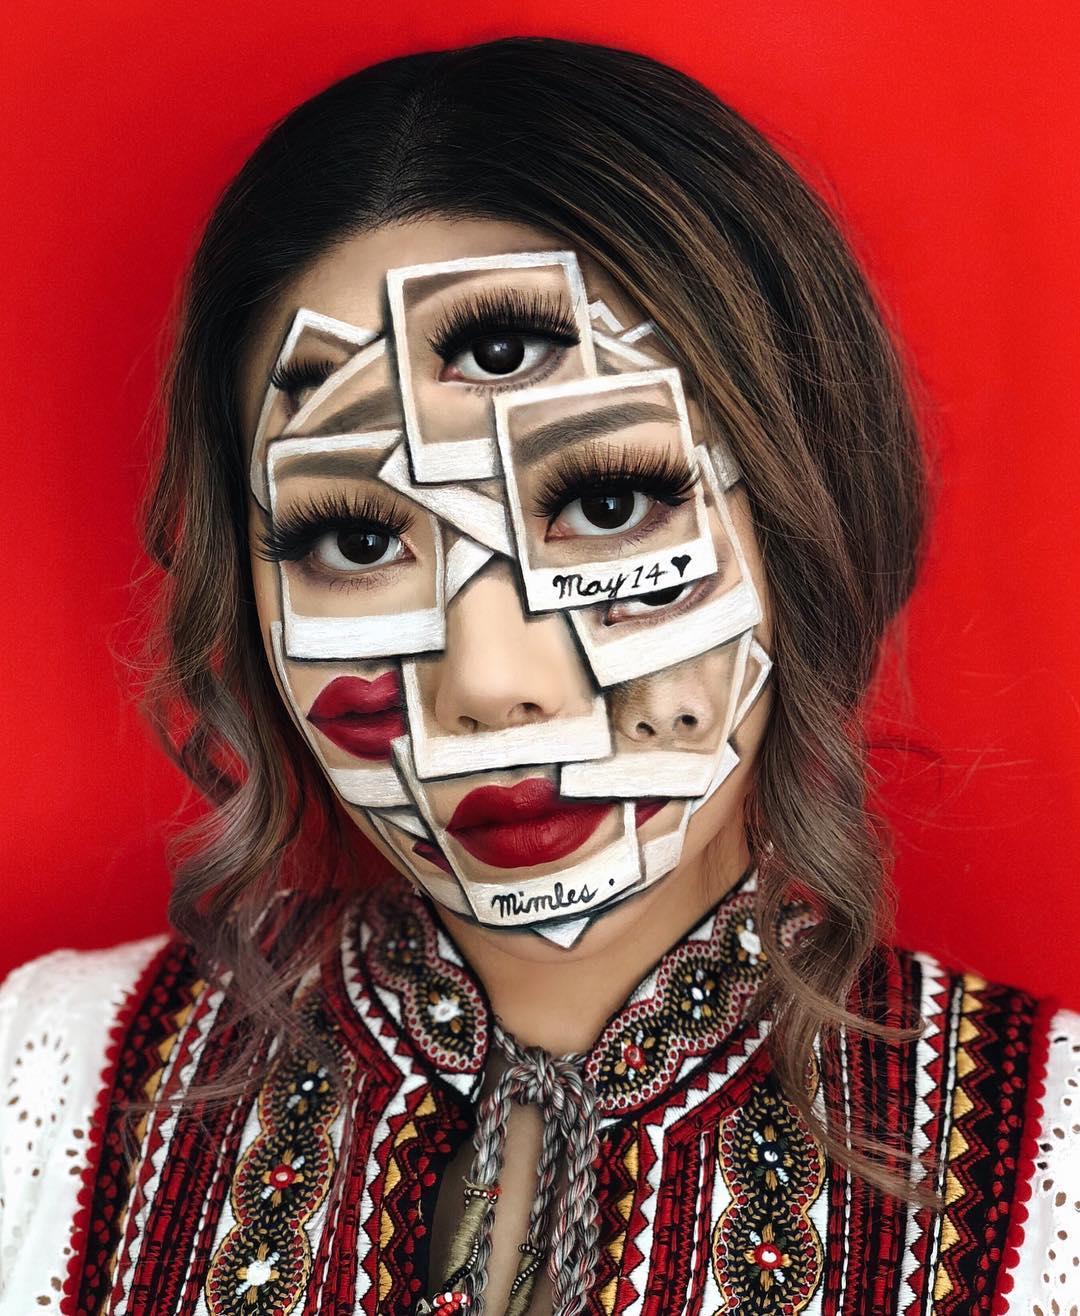 Mimi choi maquillaje ilusion optica (13)